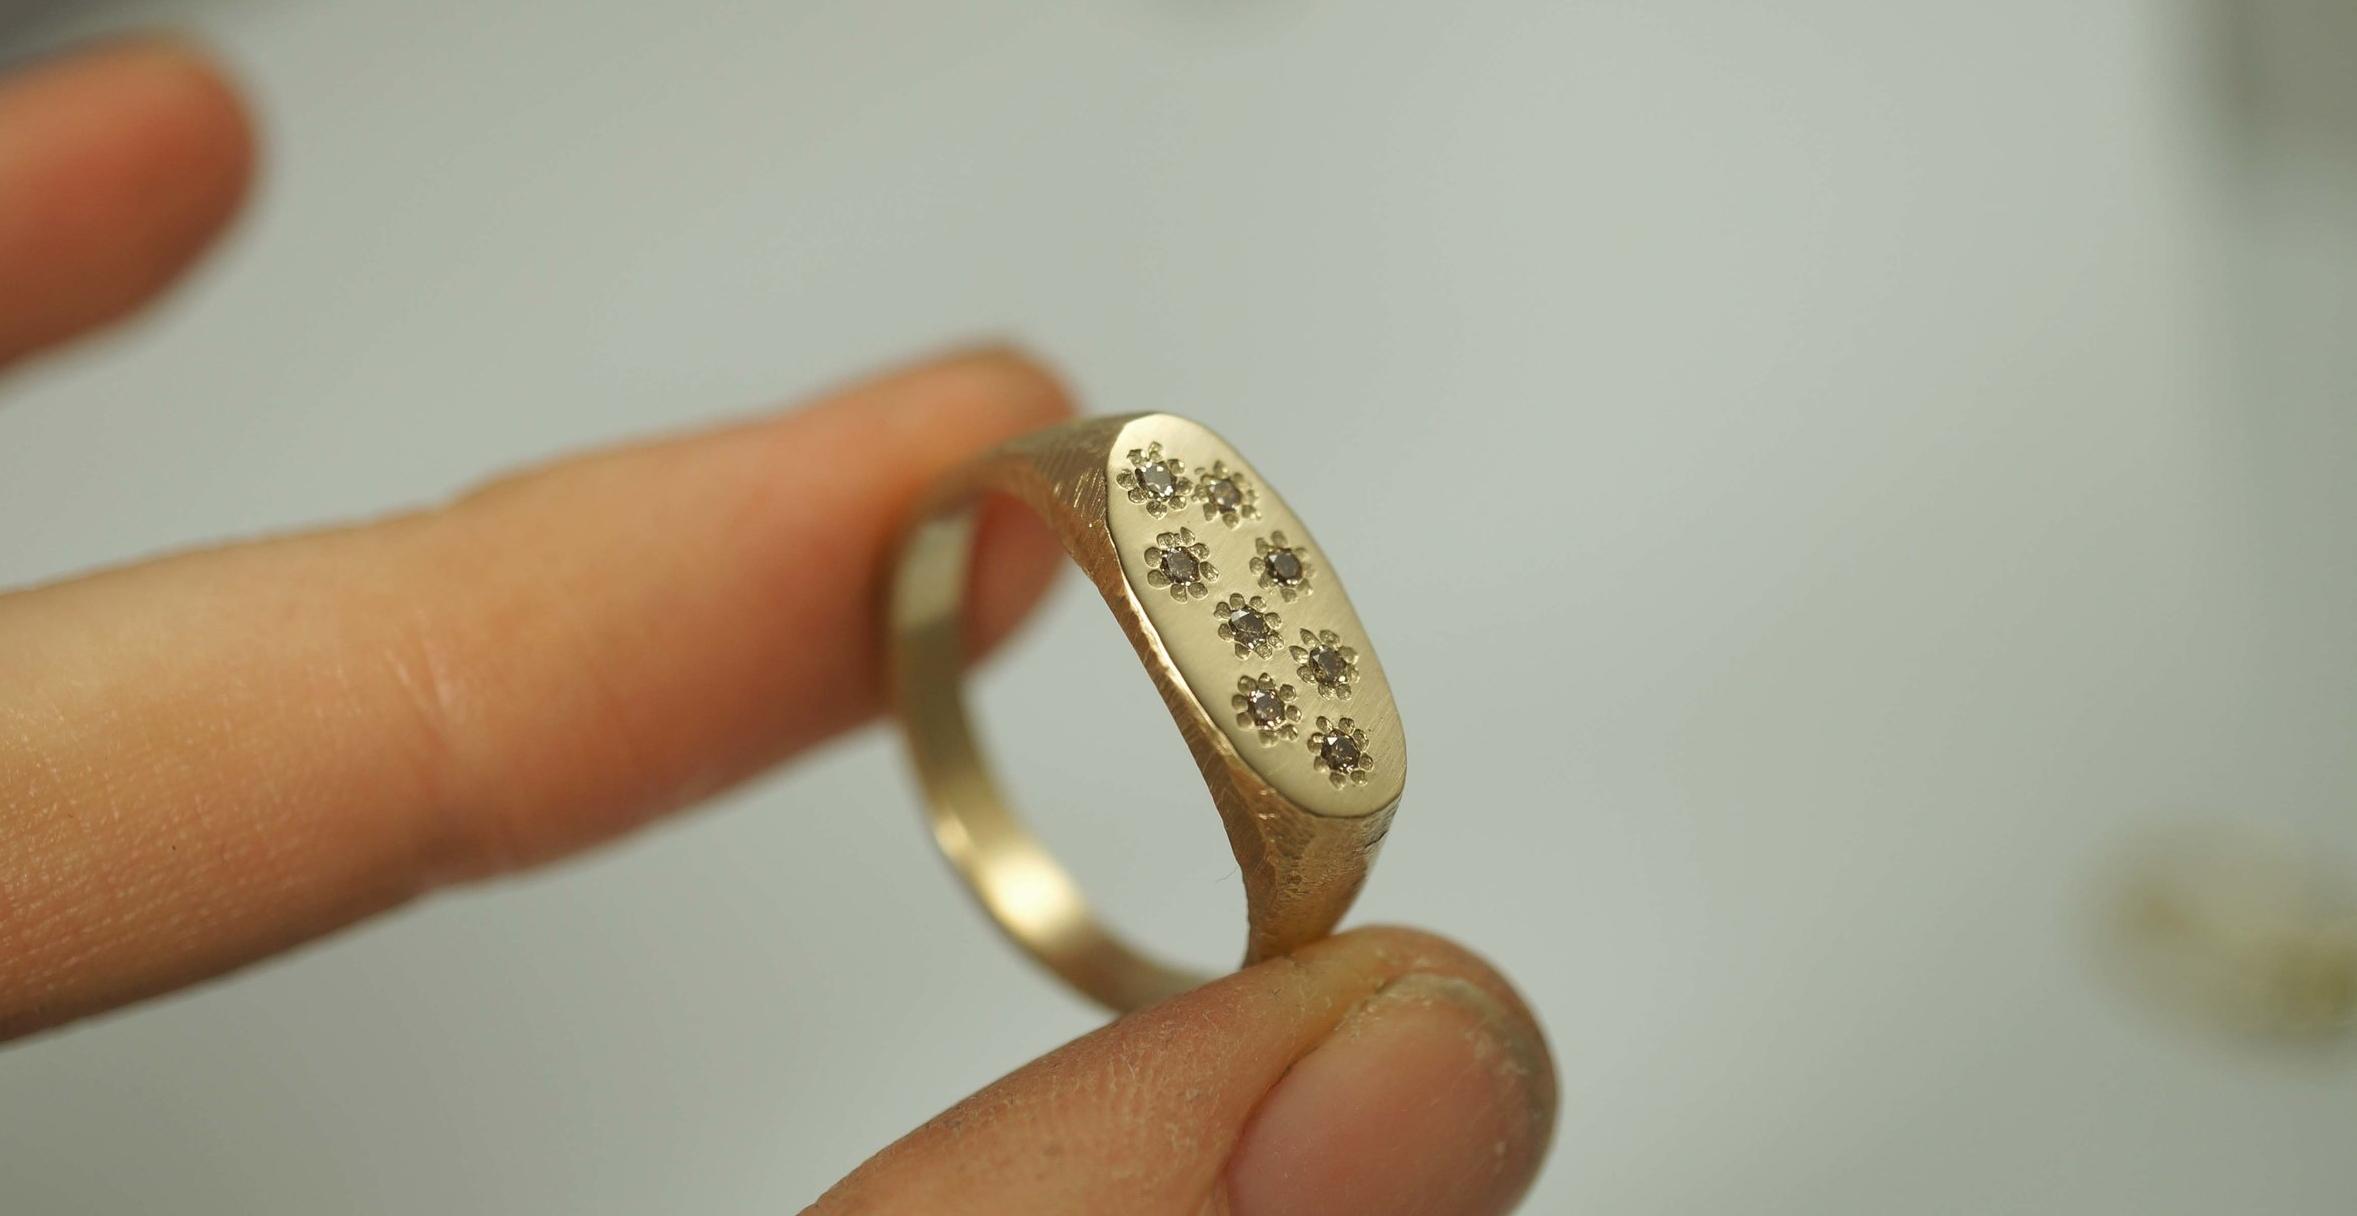 Custom gold signet ring champagne diamonds